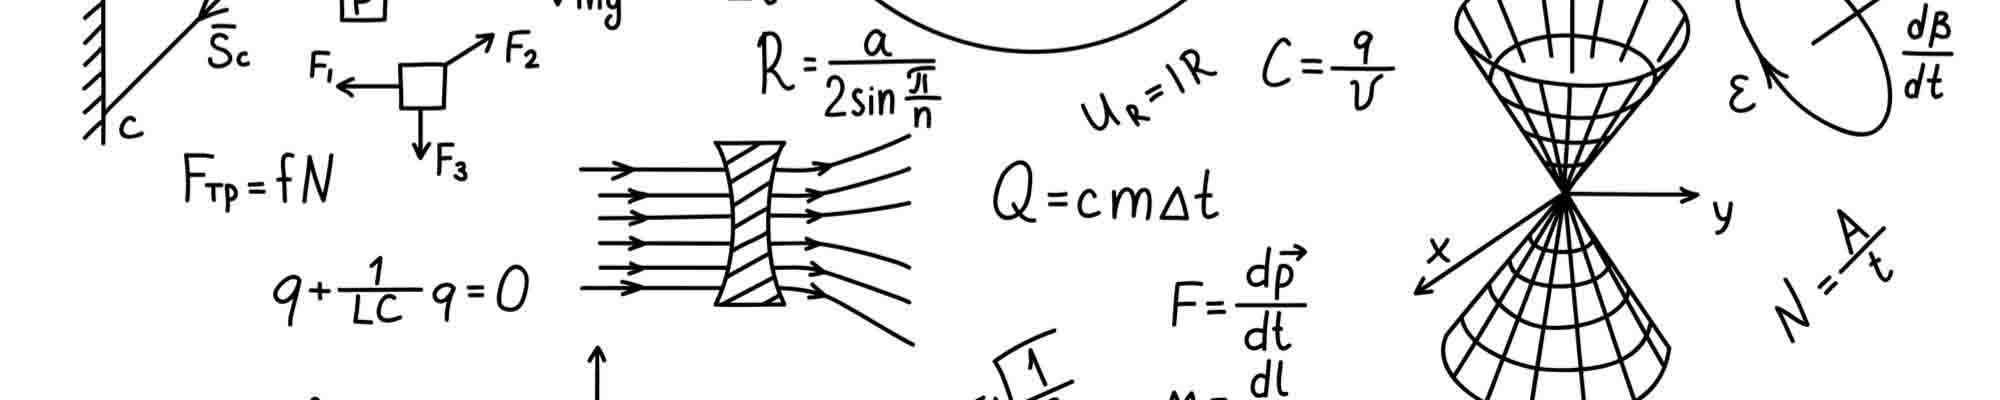 Q77 | BSc (Hons) Mathematics and Physics | Open University